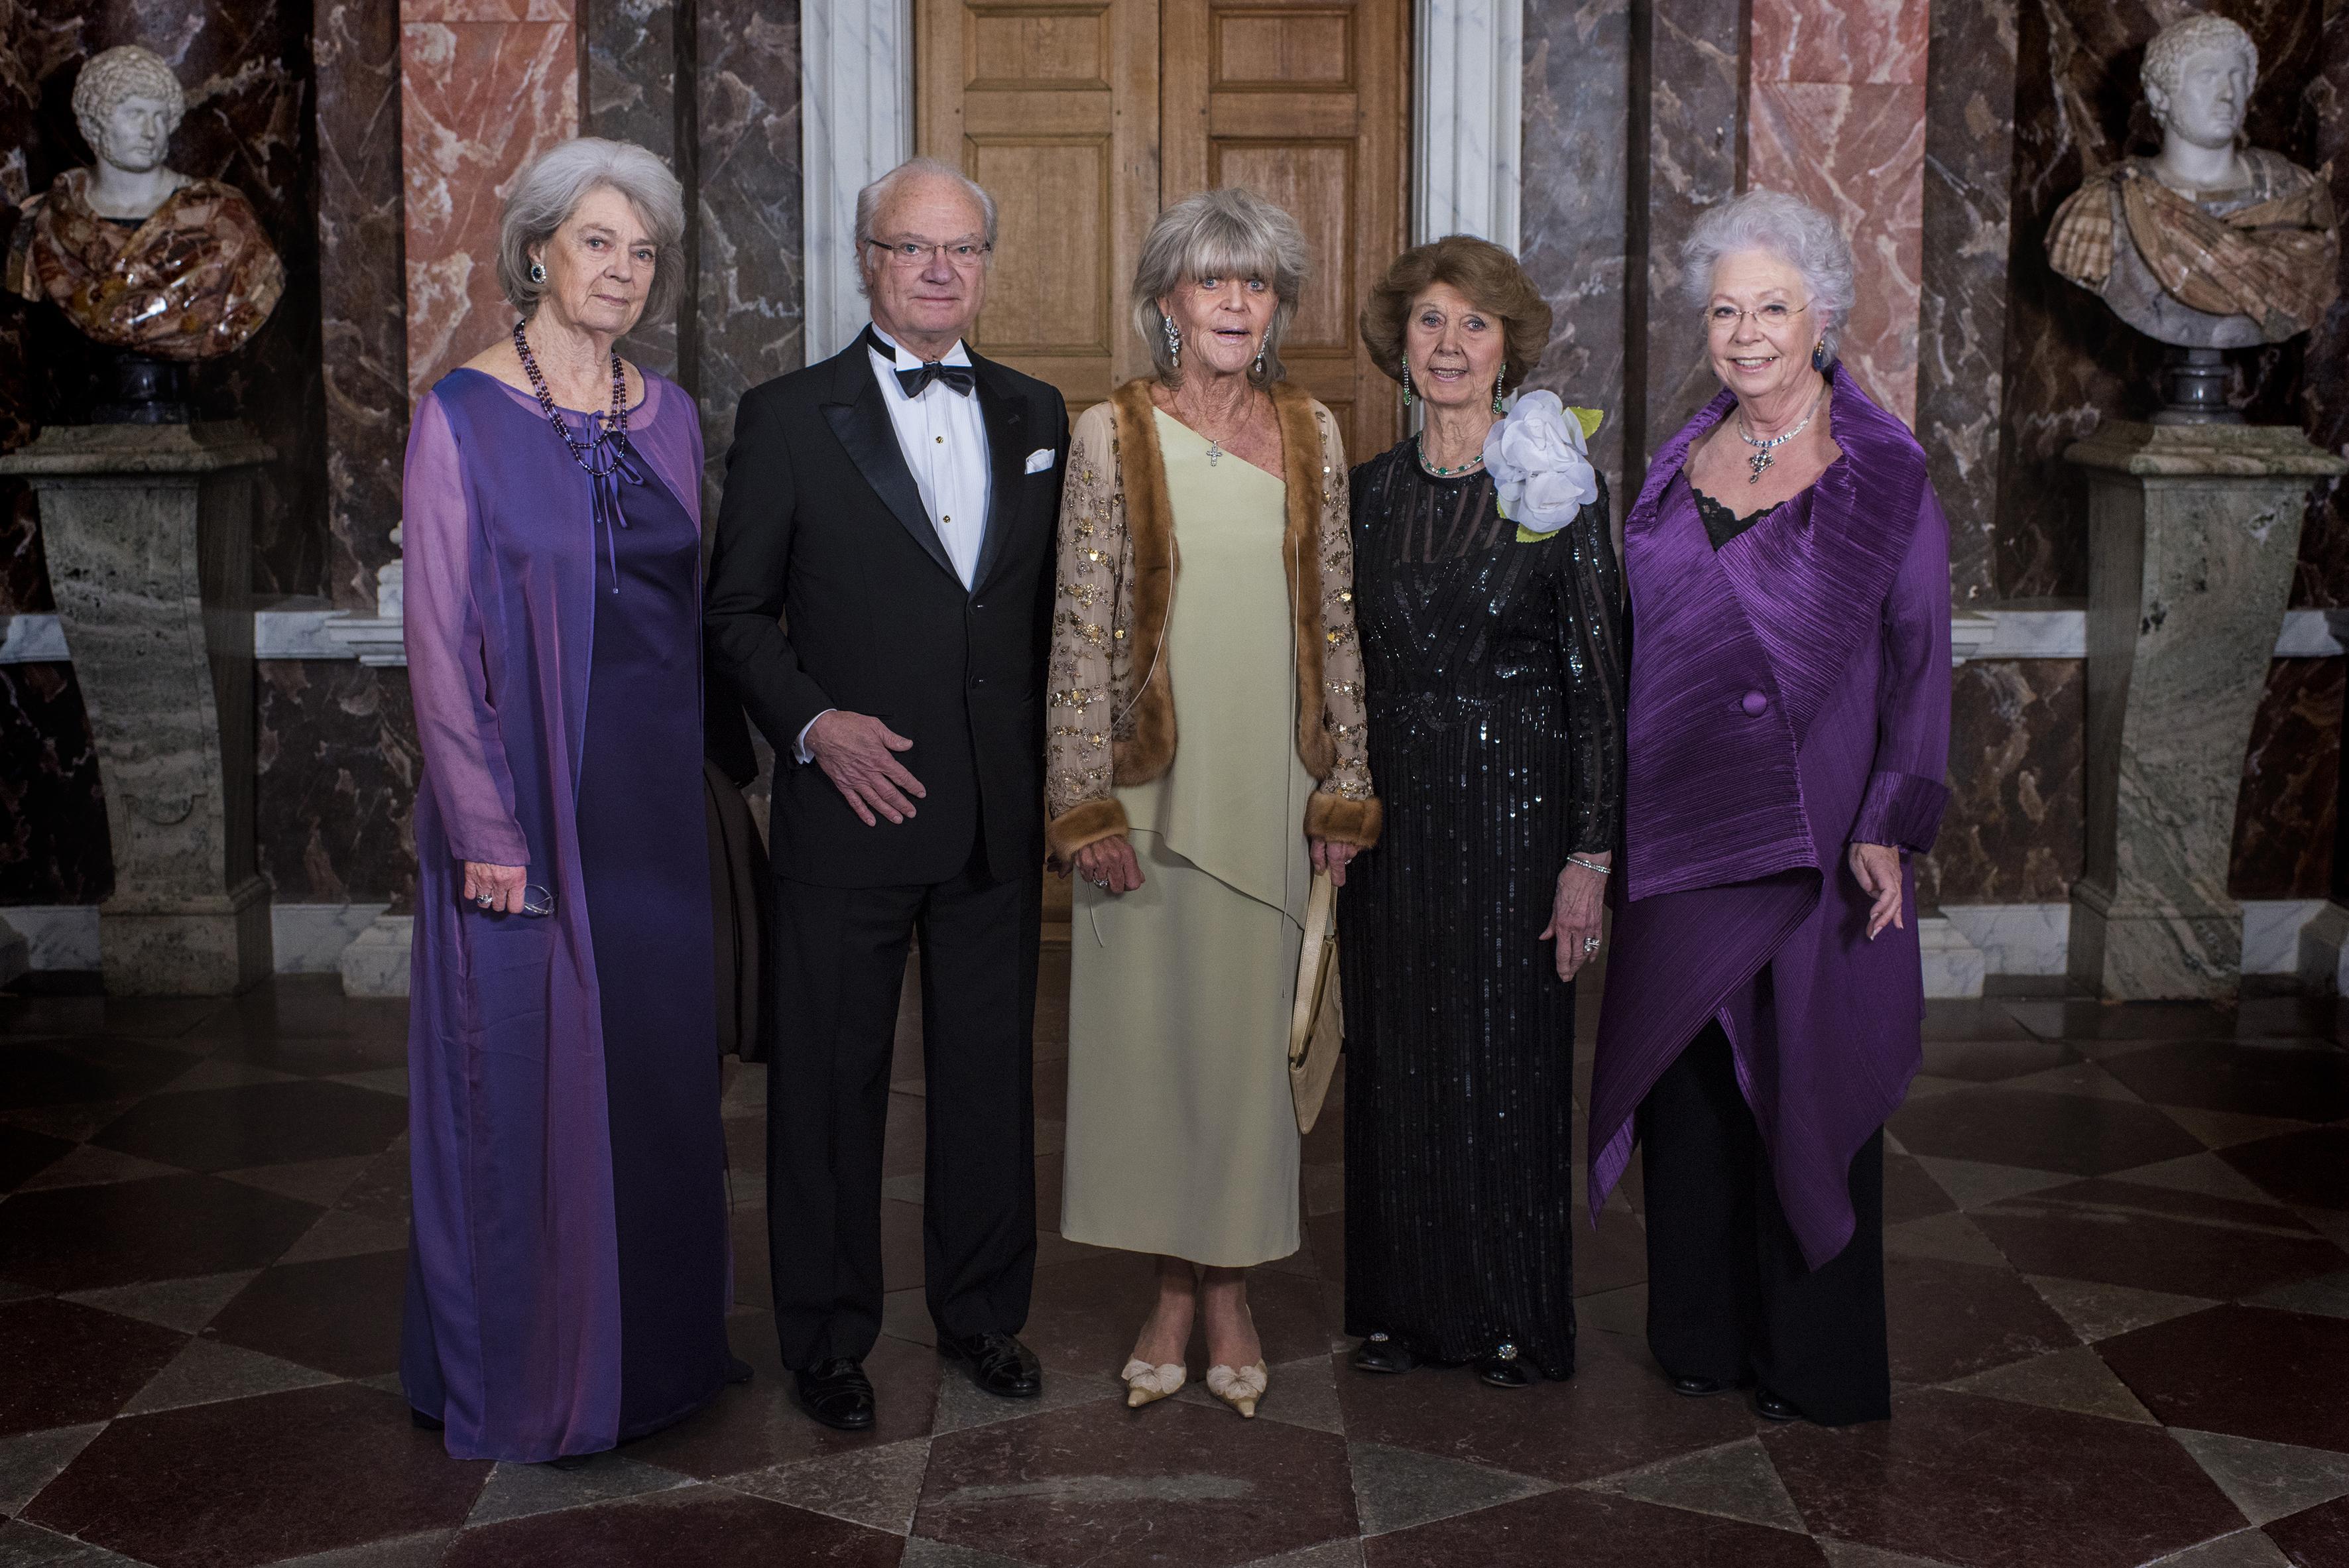 Prinzessin Margaretha, König Carl Gustaf, Prinzessin Birgitta, Prinzessin Désirée und Prinzessin Christina.